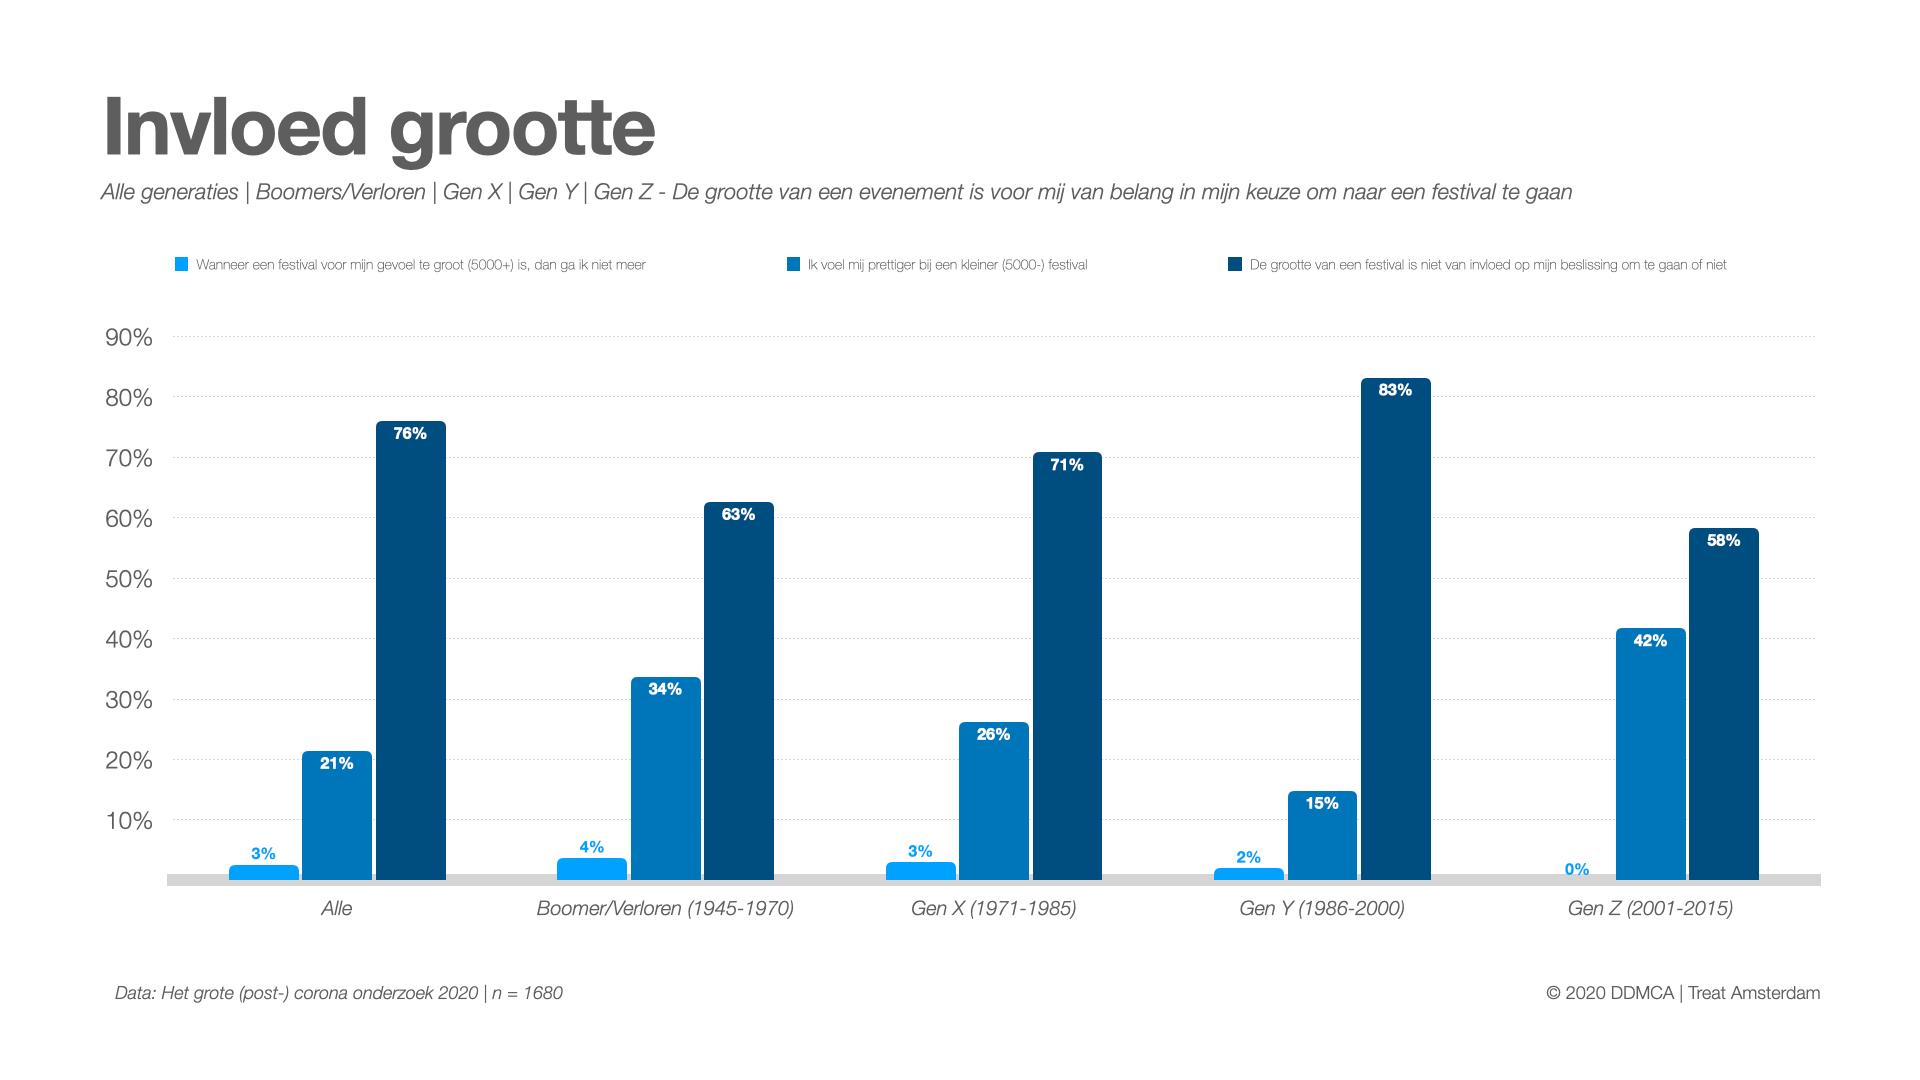 Post-corona onderzoek 2020